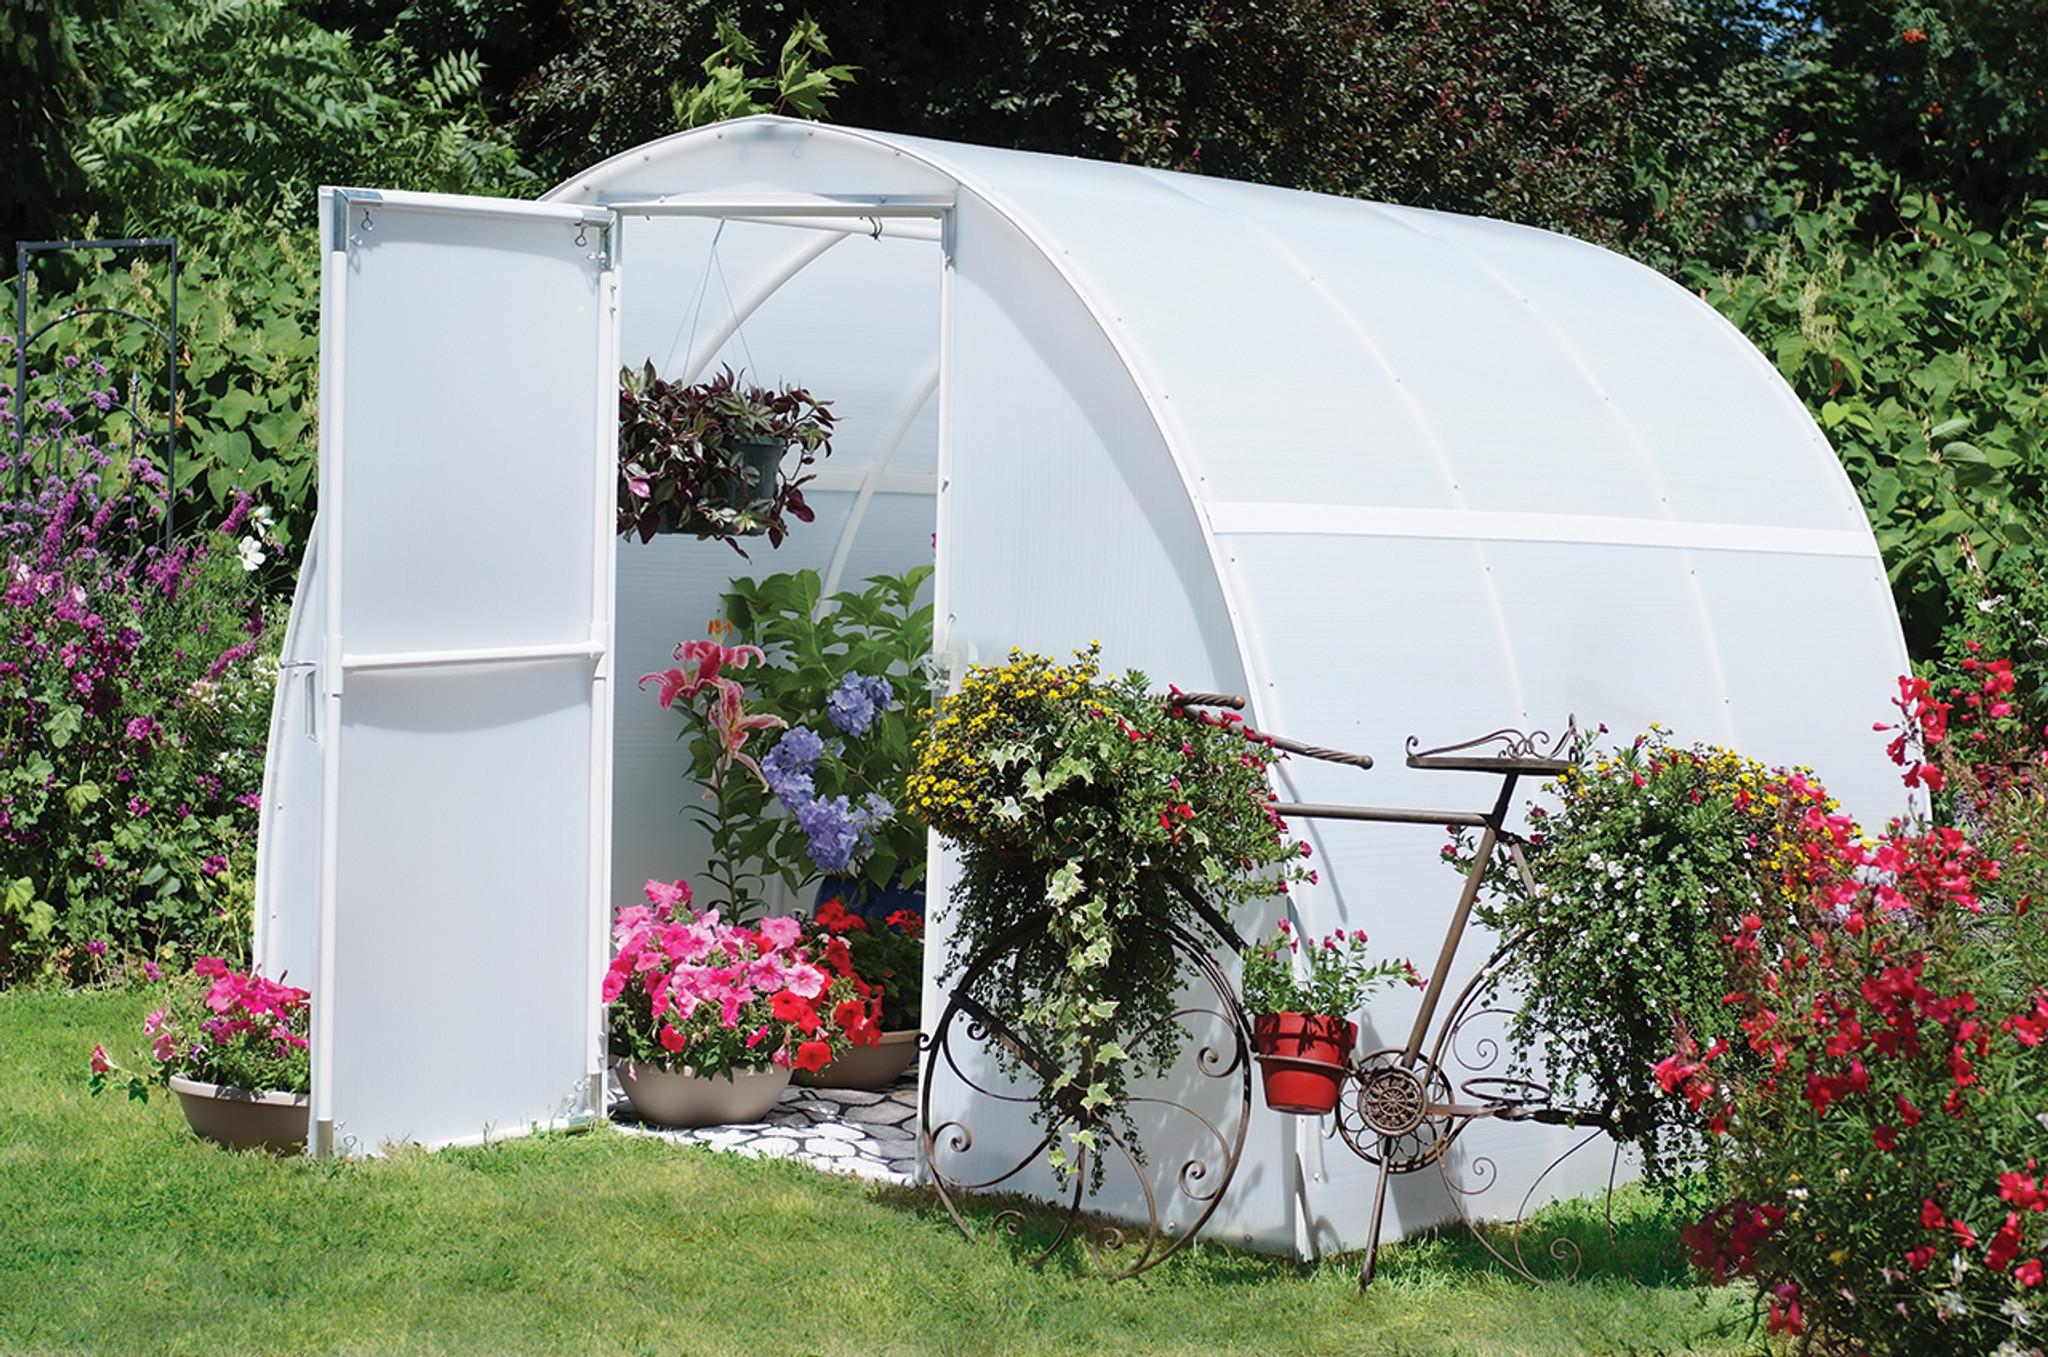 Solexx Early Bloomer Greenhouse Kit 8' x 8' x 6'3